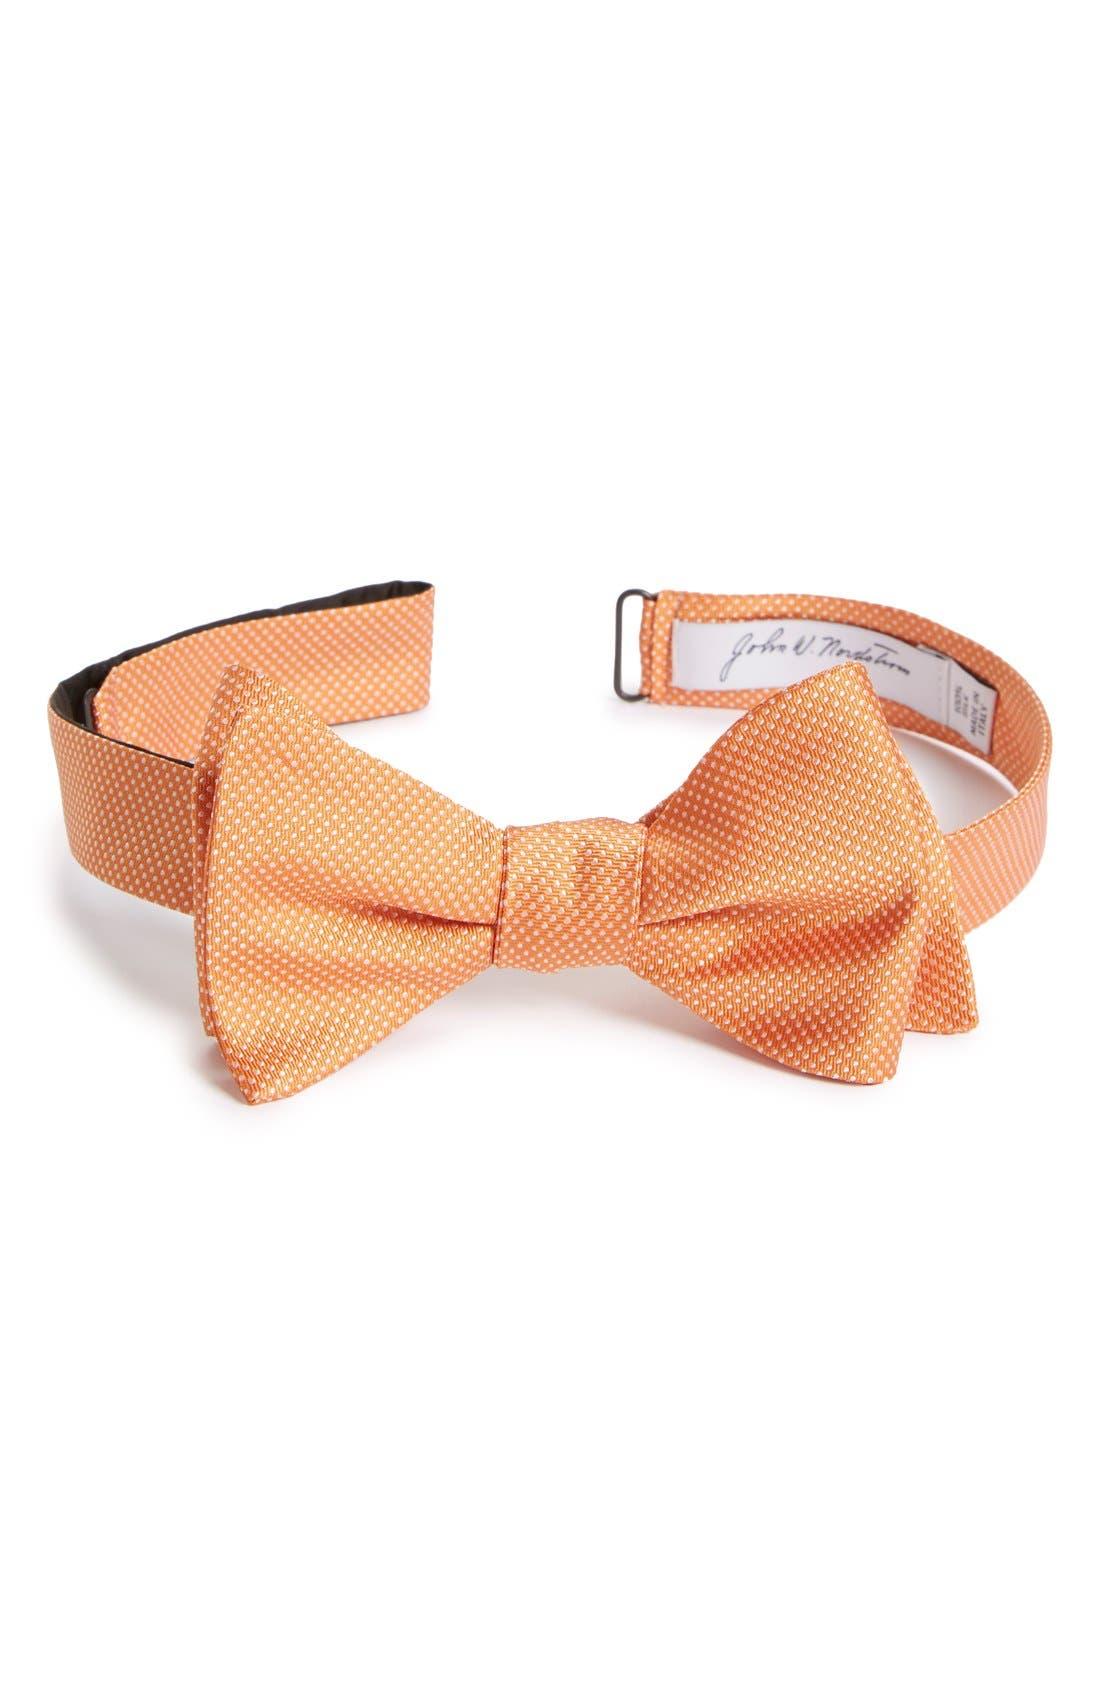 Dot Silk Bow Tie,                             Main thumbnail 1, color,                             Orange